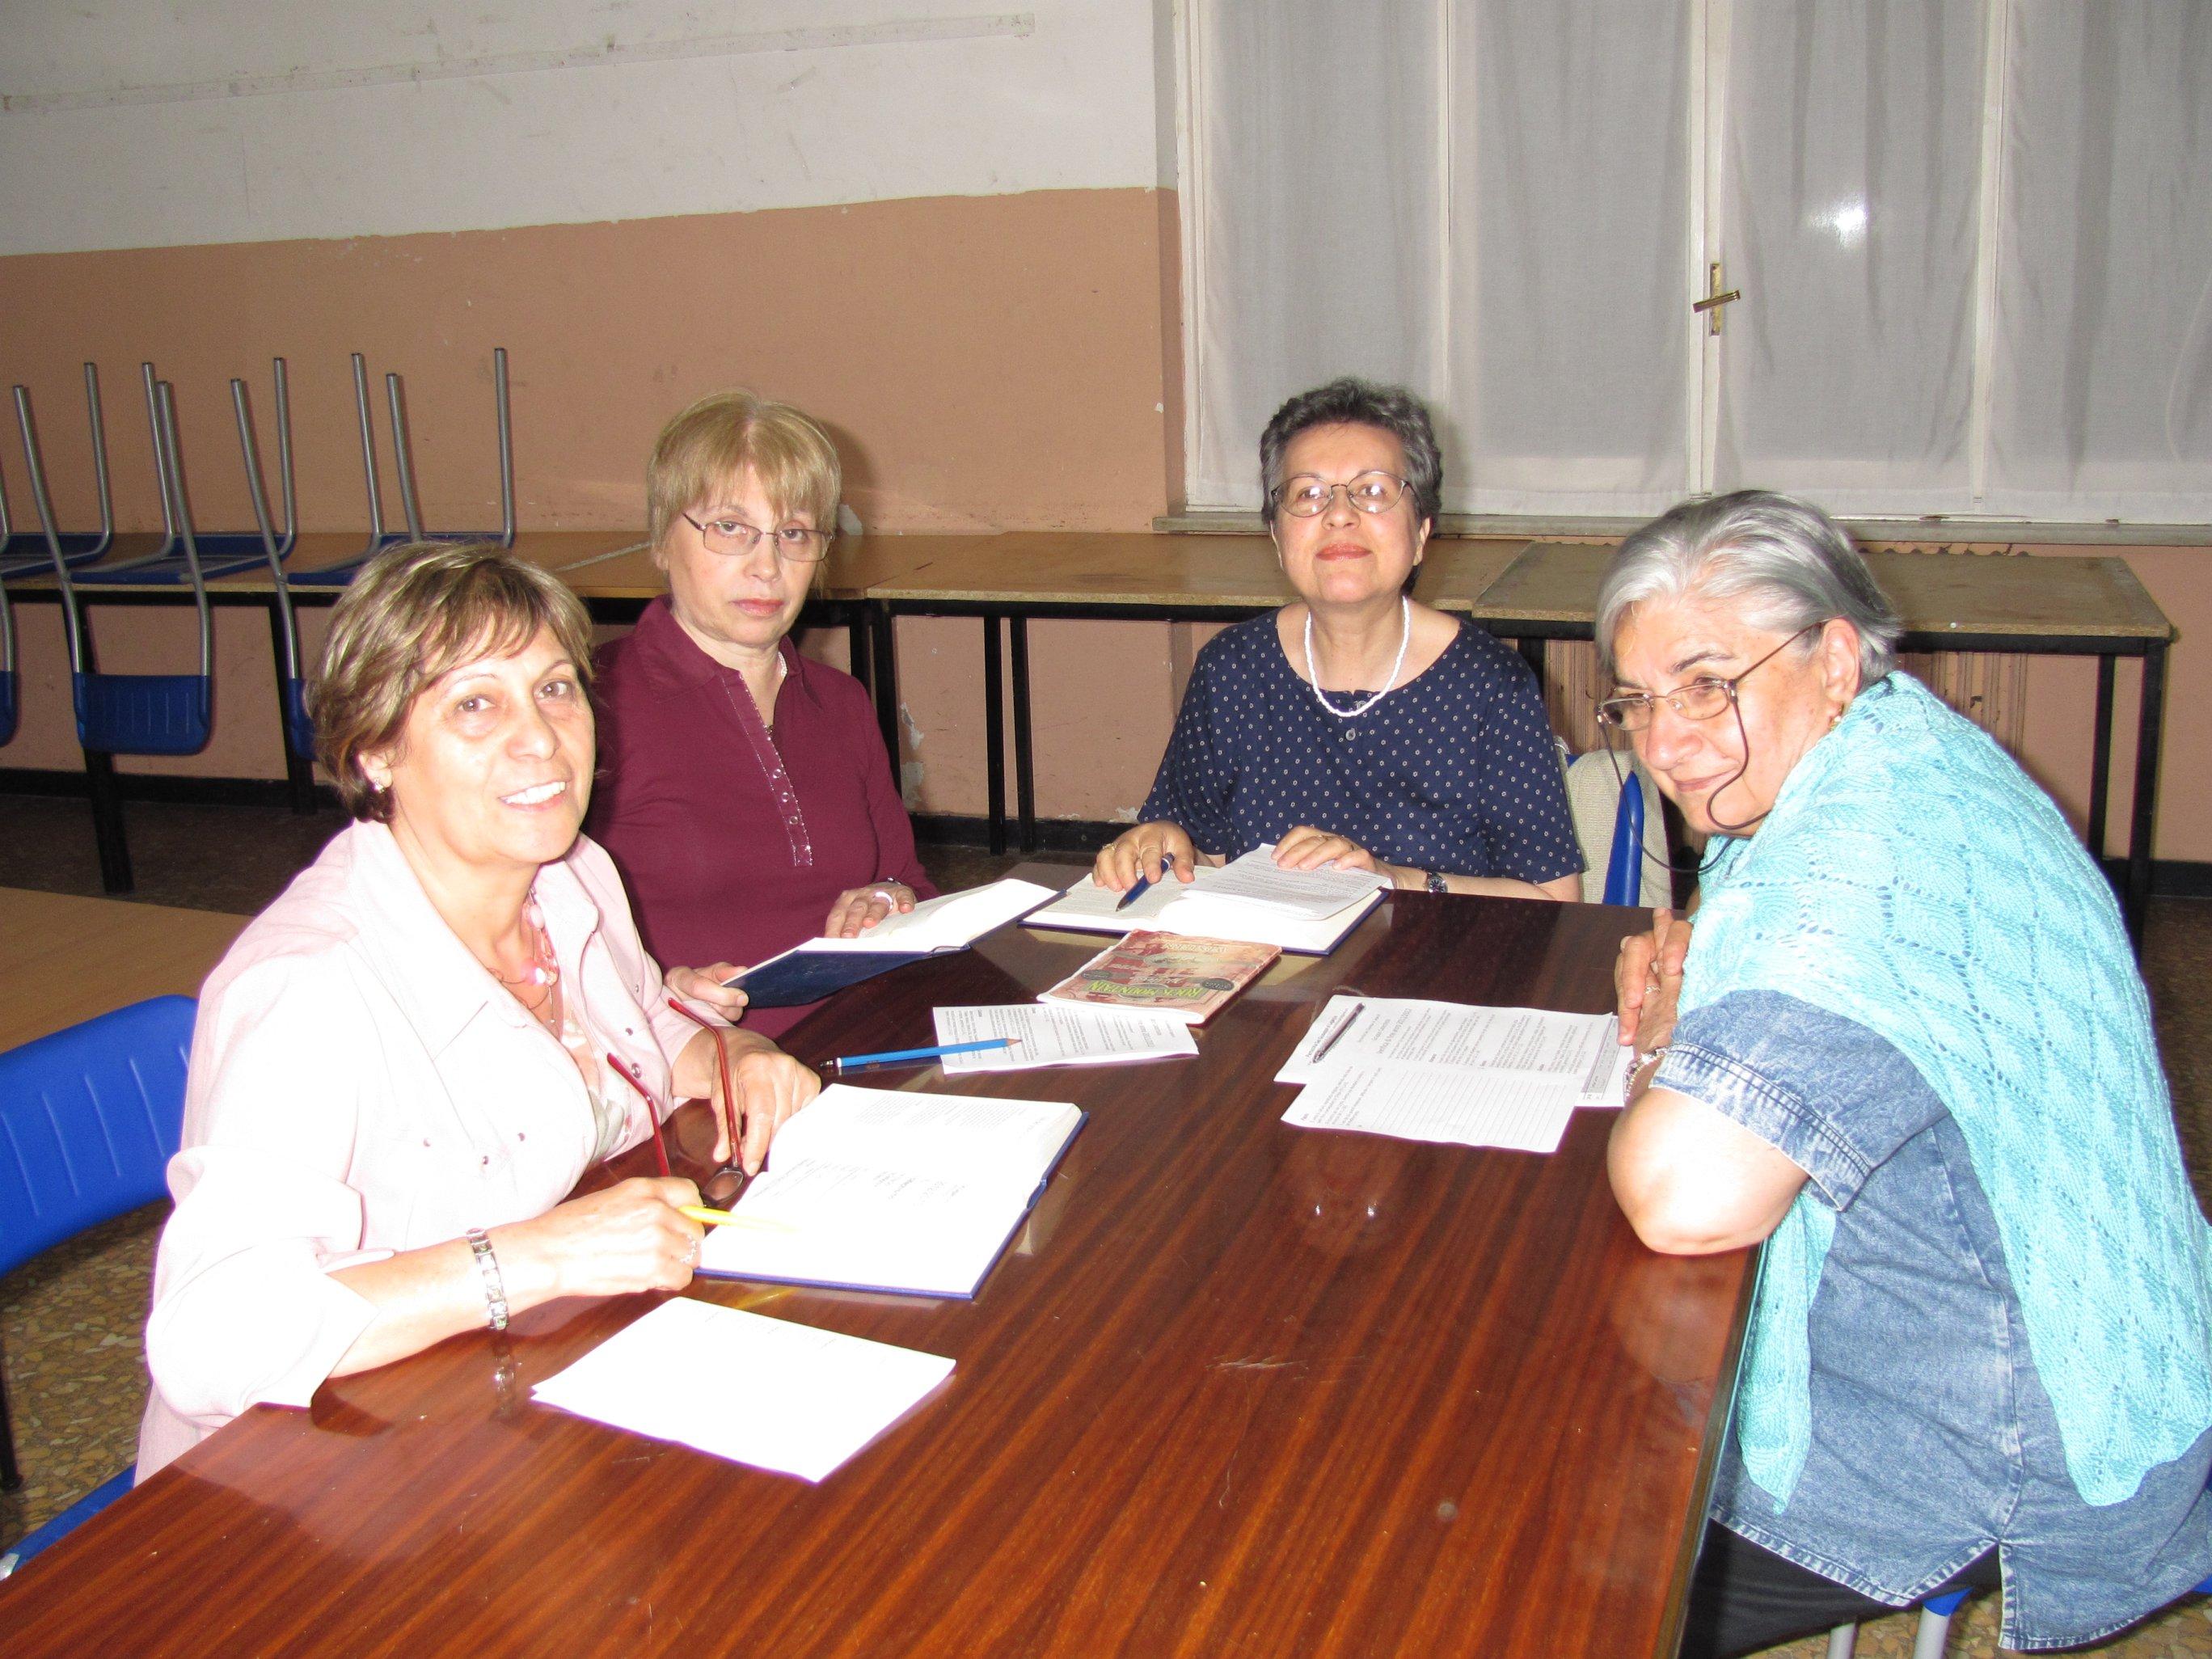 verifica_catechiste_2012-06-11-18-19-26